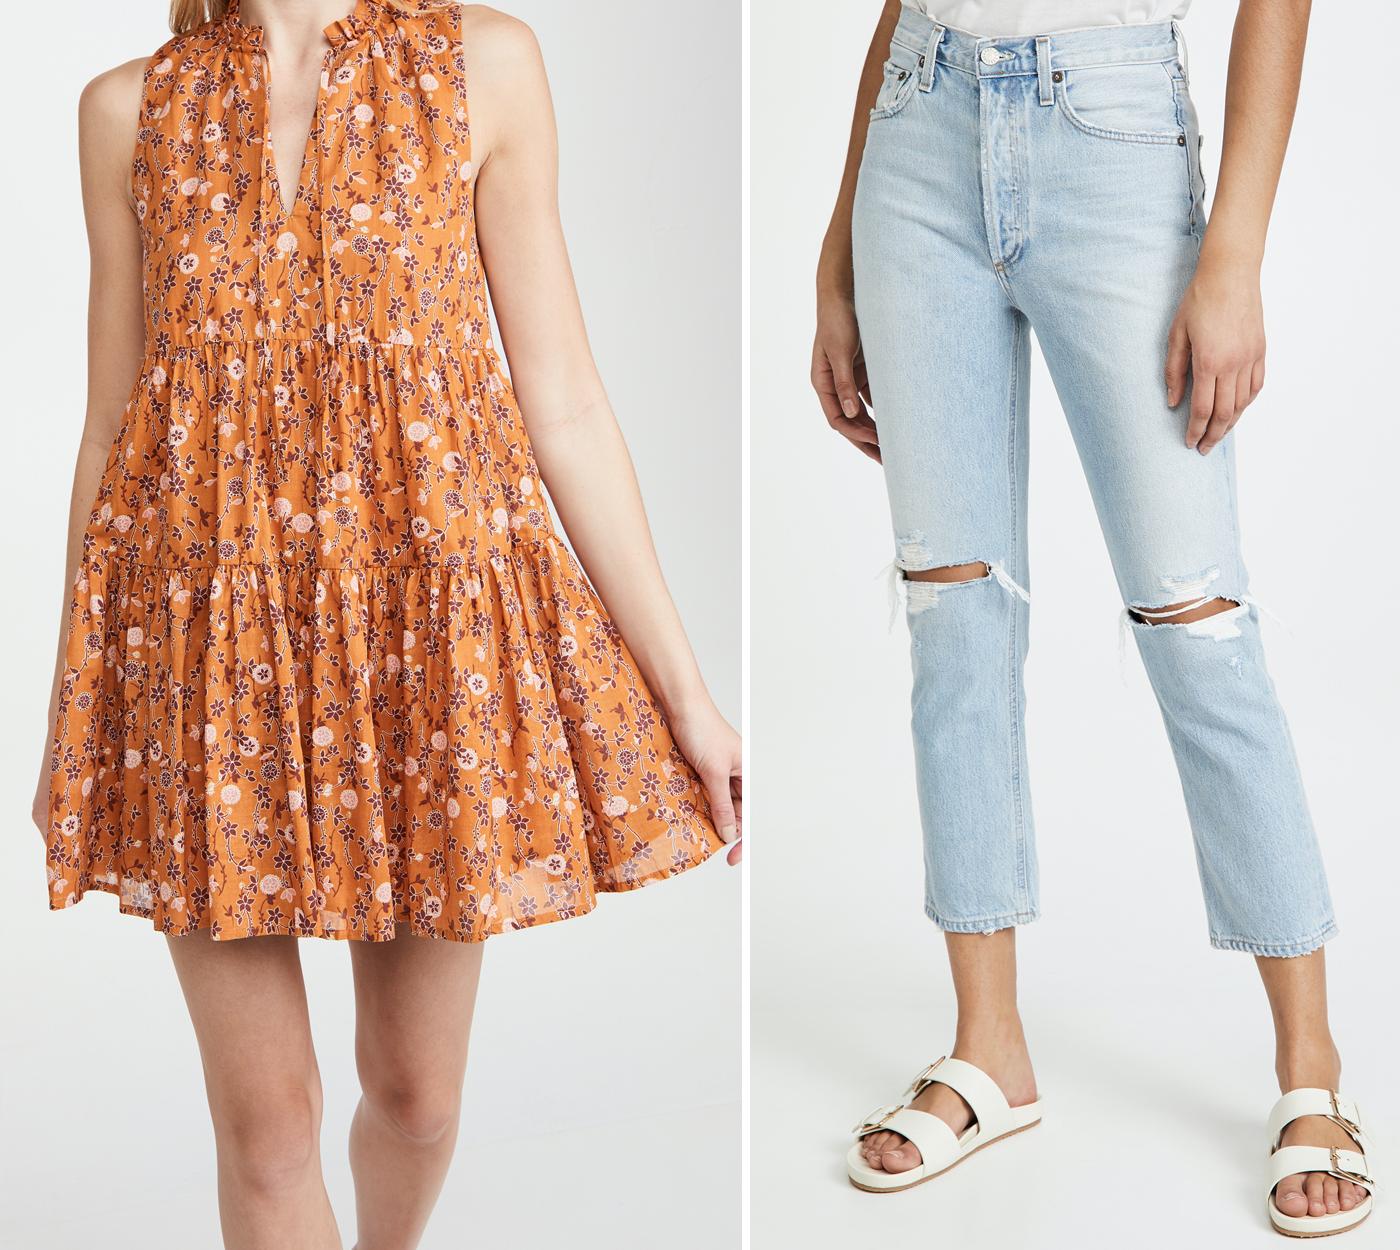 shopbop summer trends